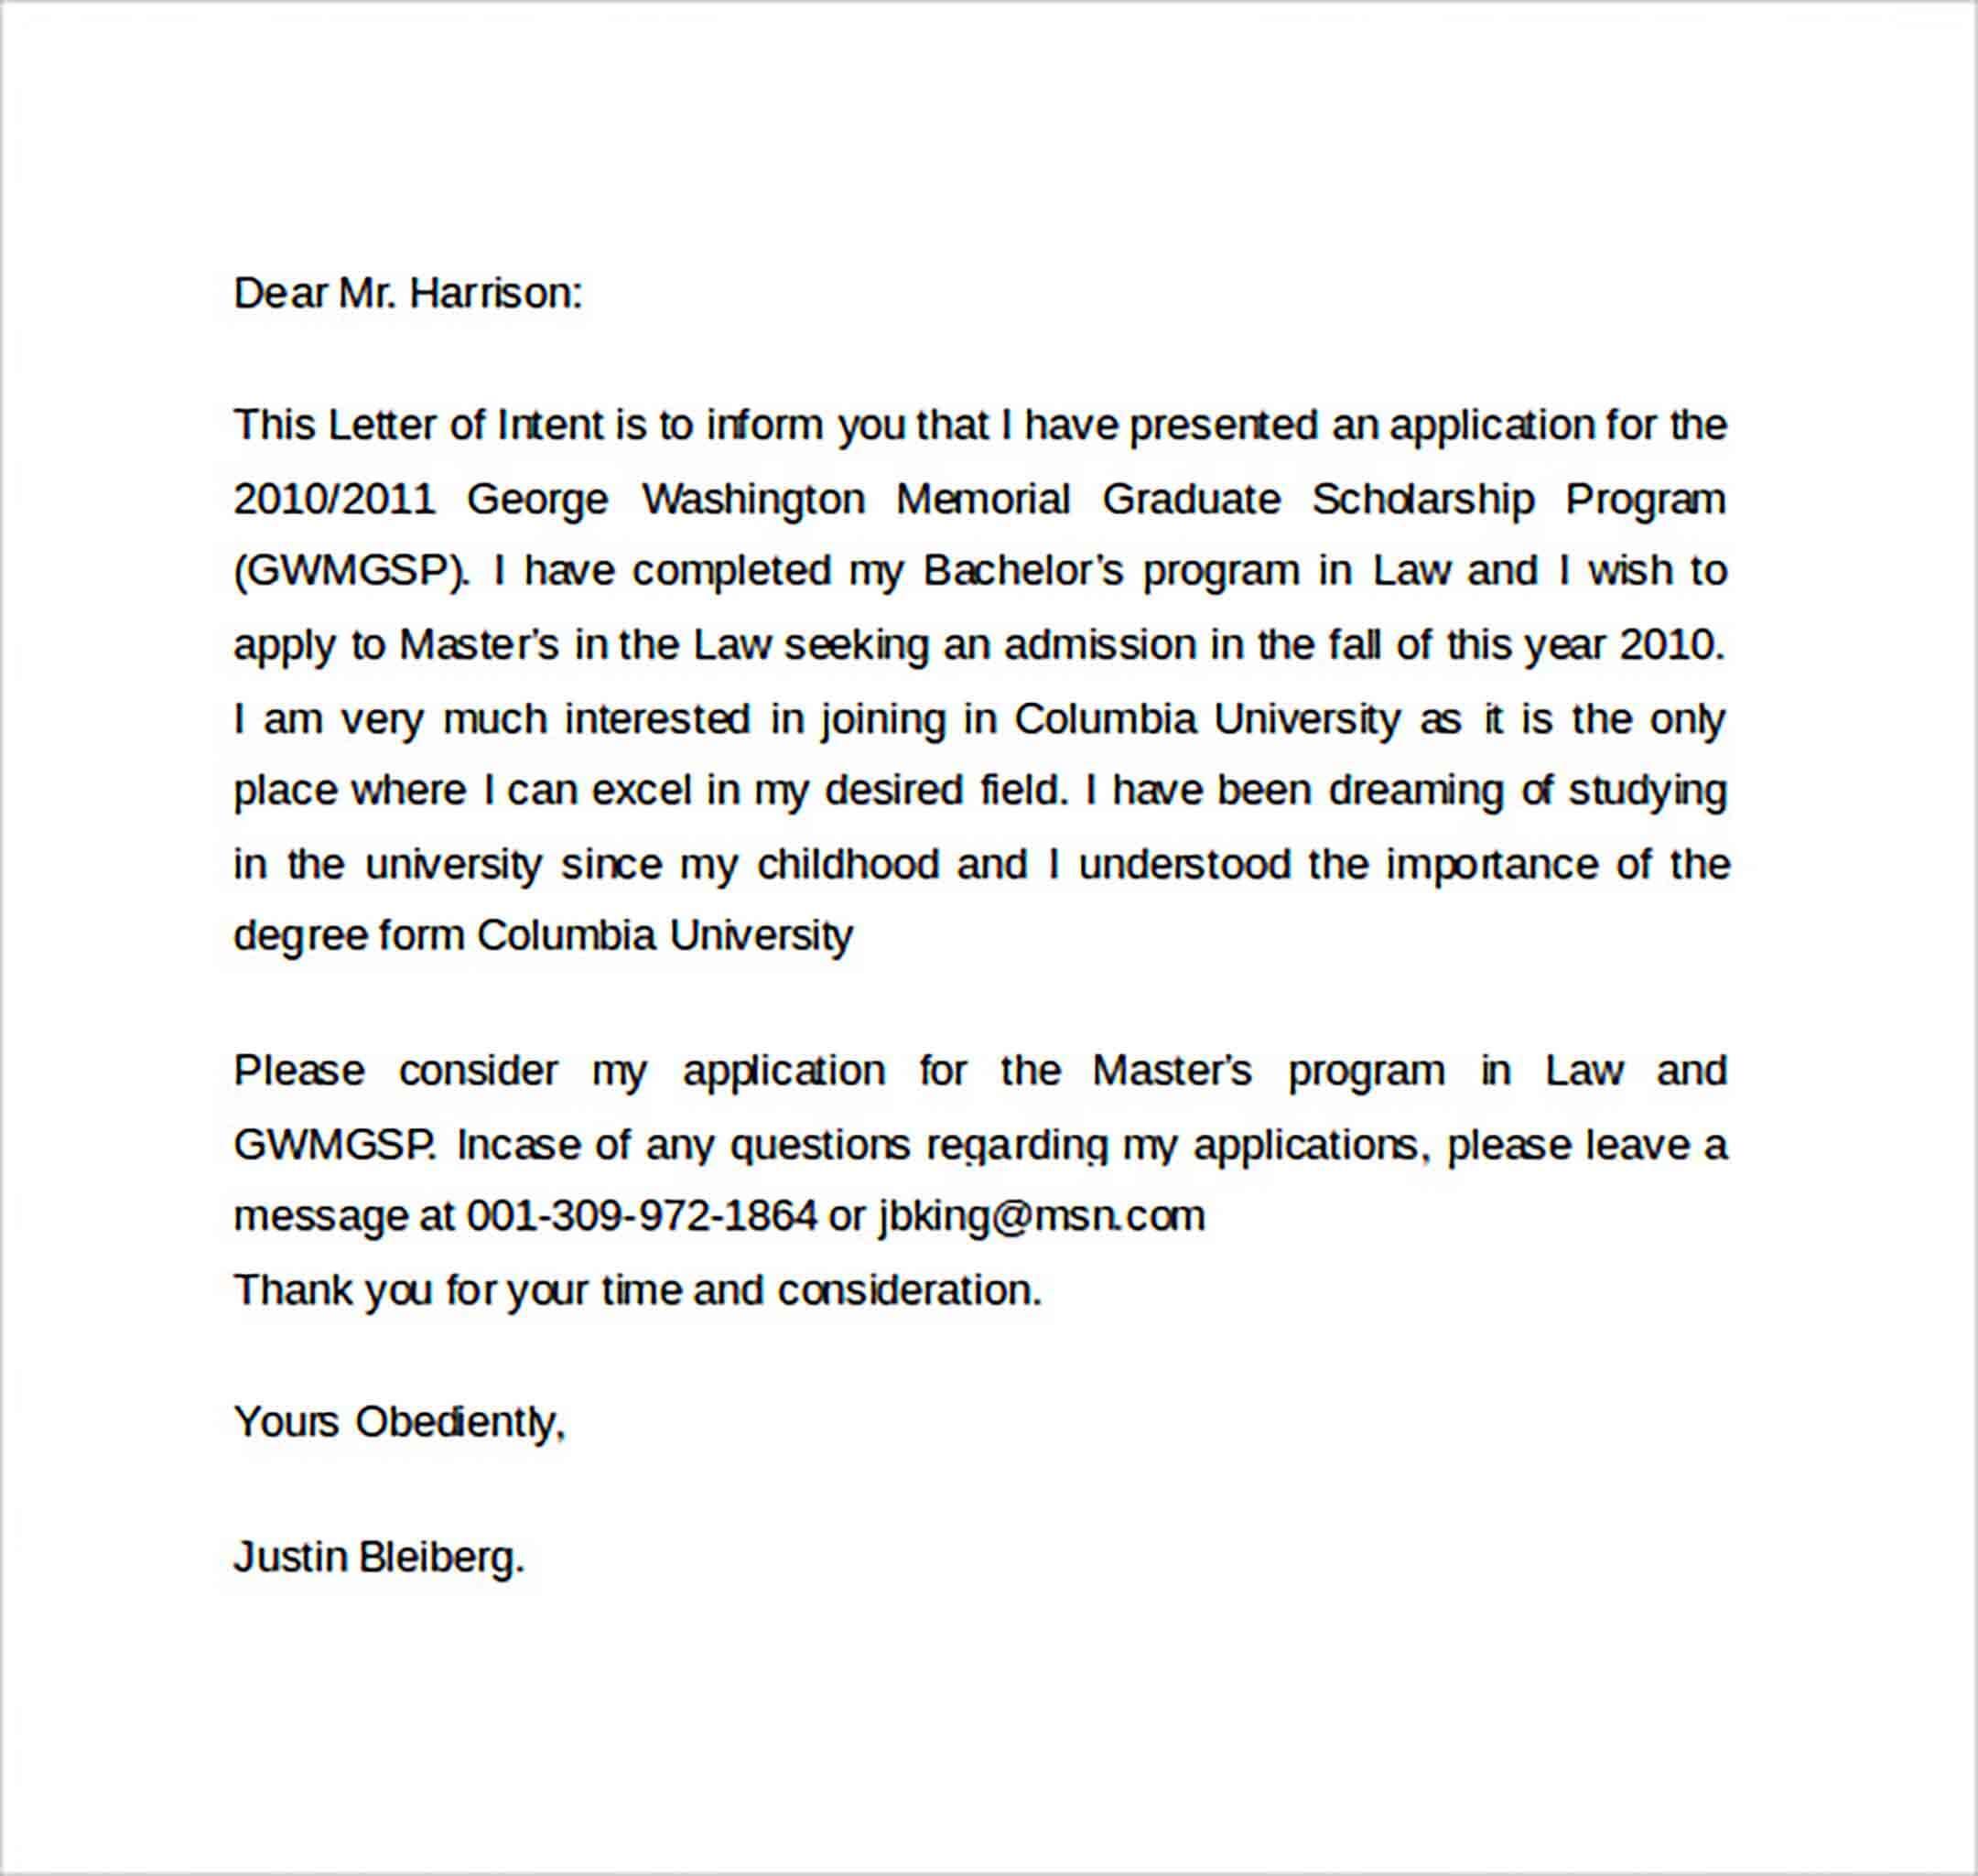 Letter of Intent templates Graduate School